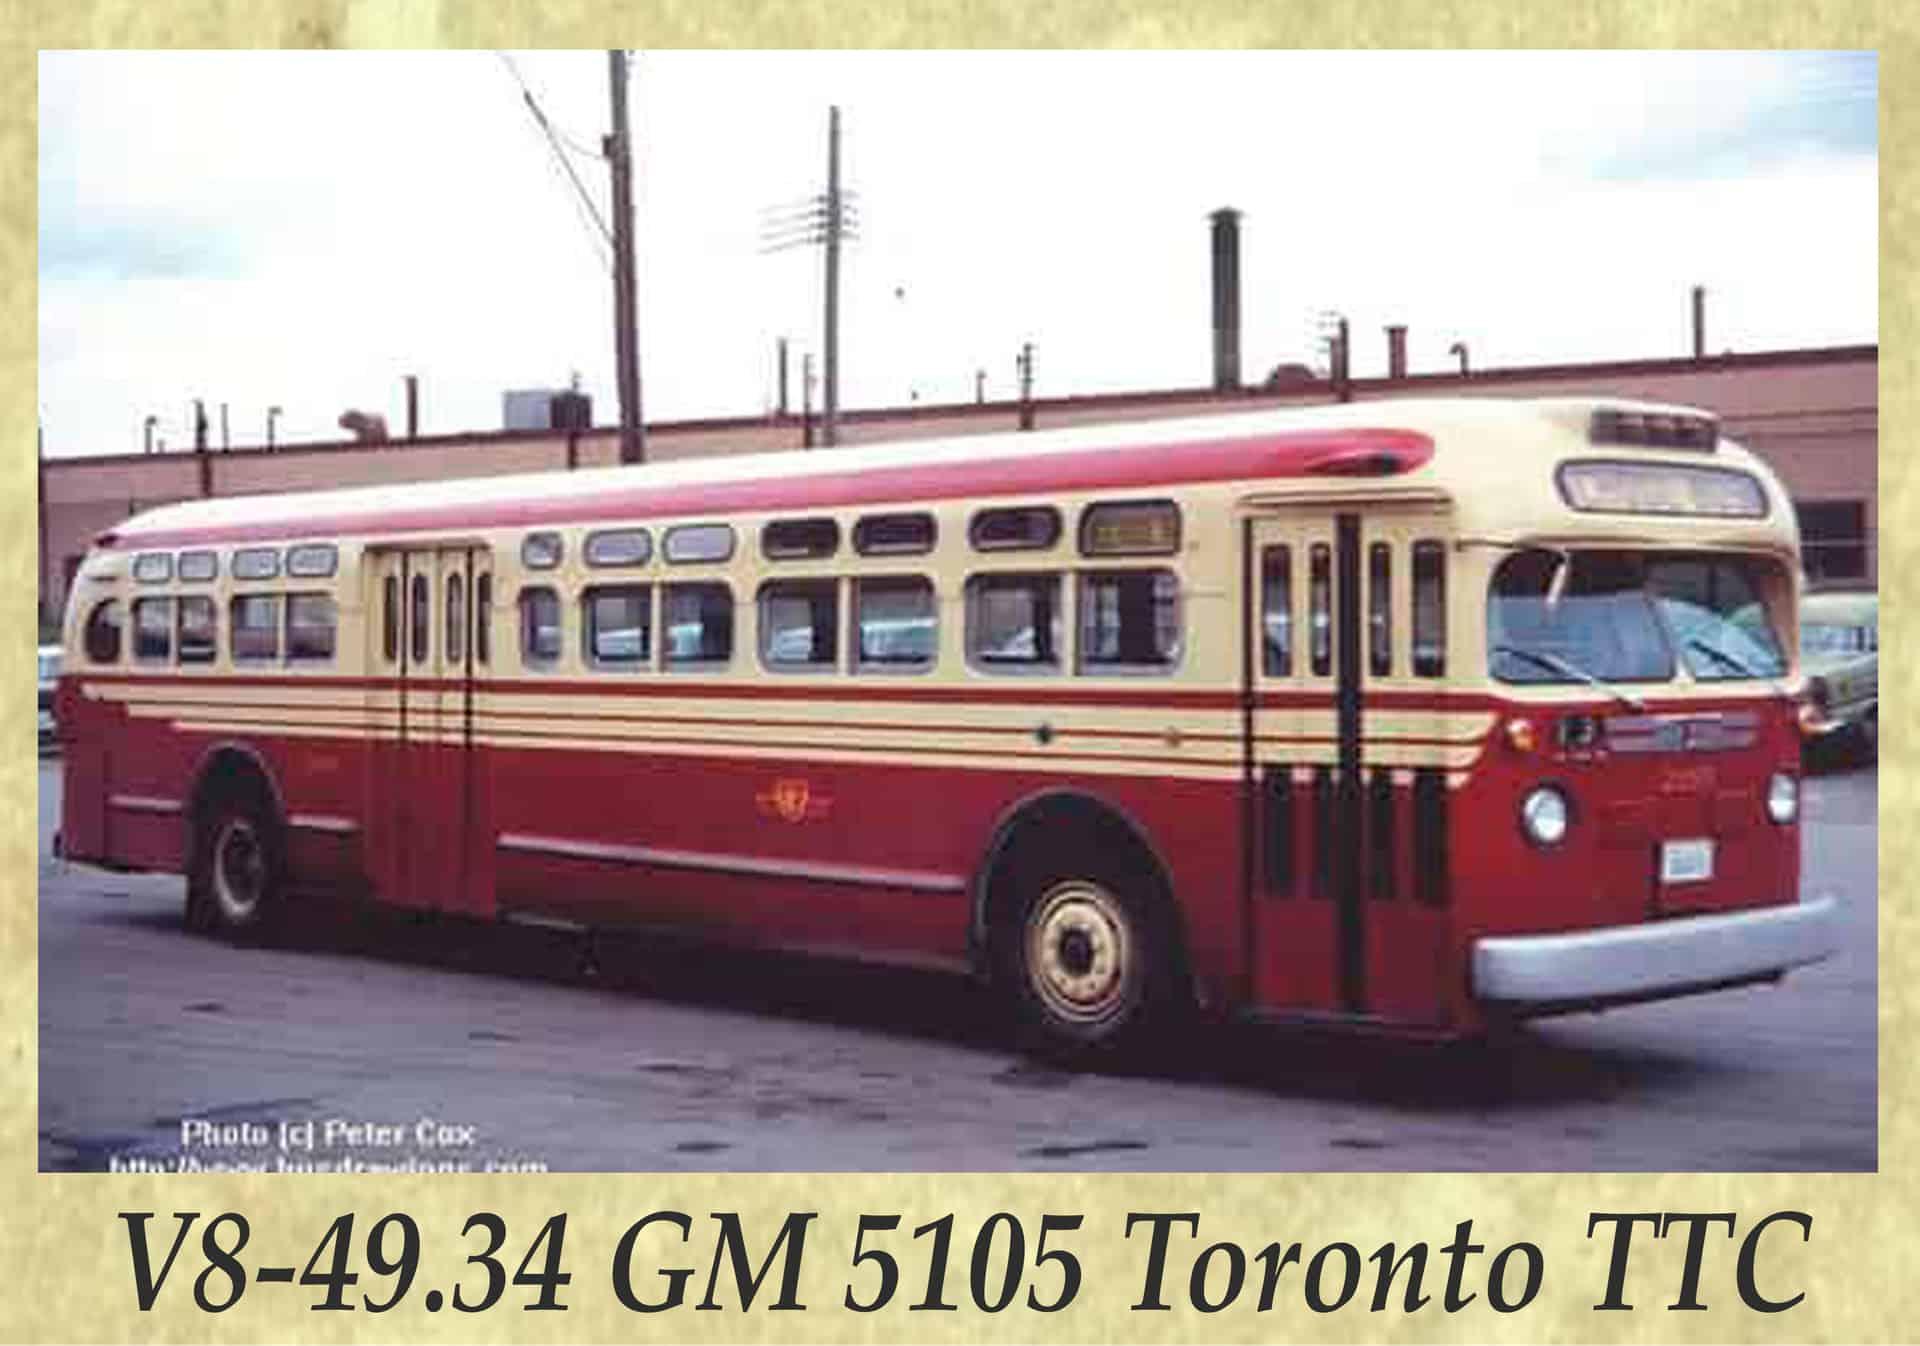 V8-49.34 GM 5105 Toronto TTC